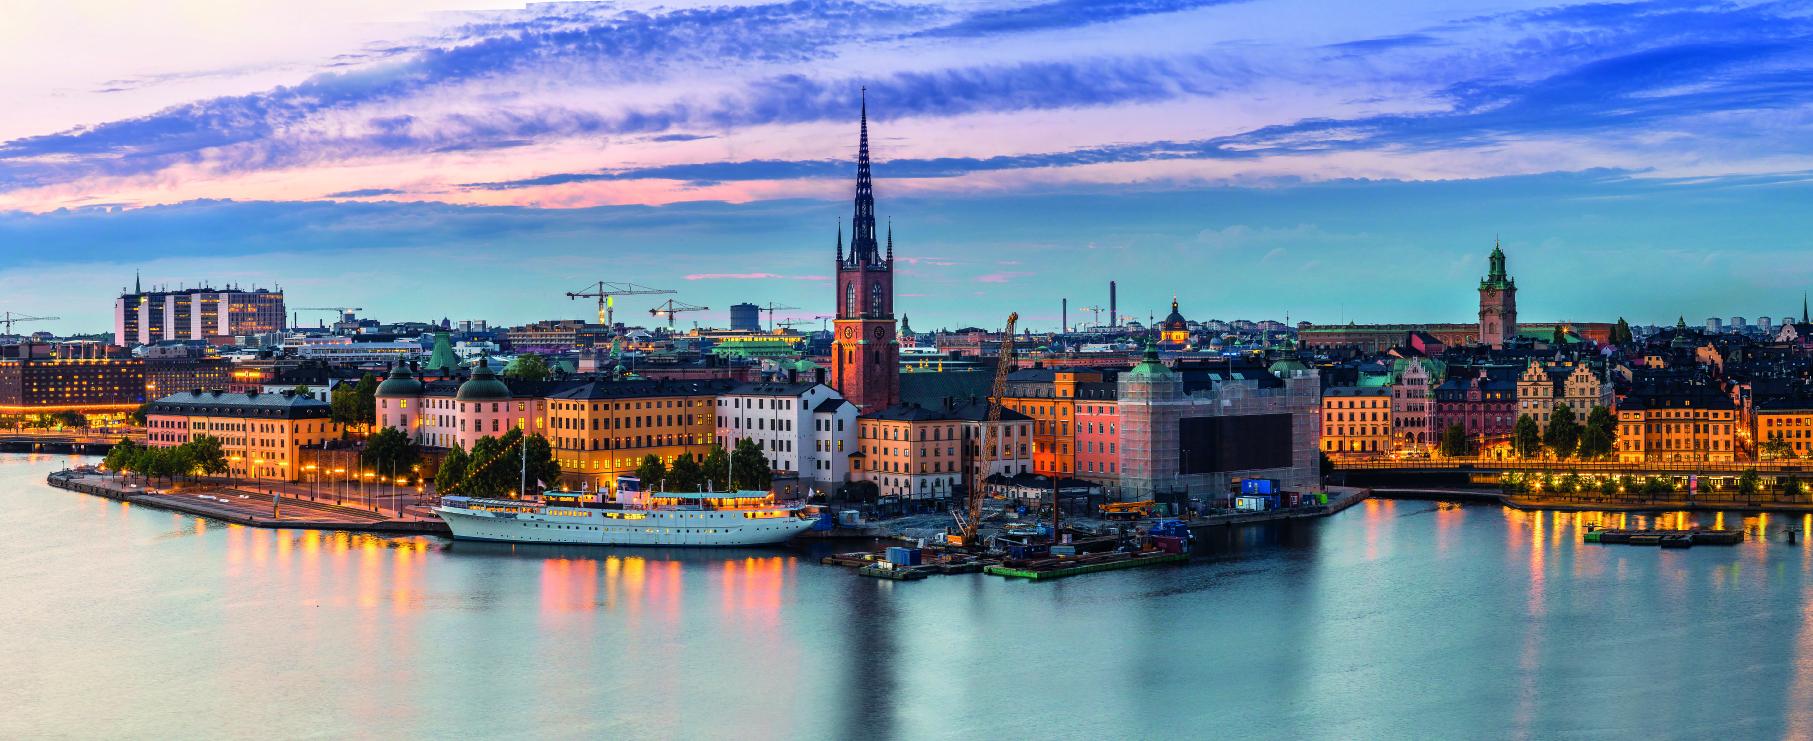 Savecore utökar i Stockholm